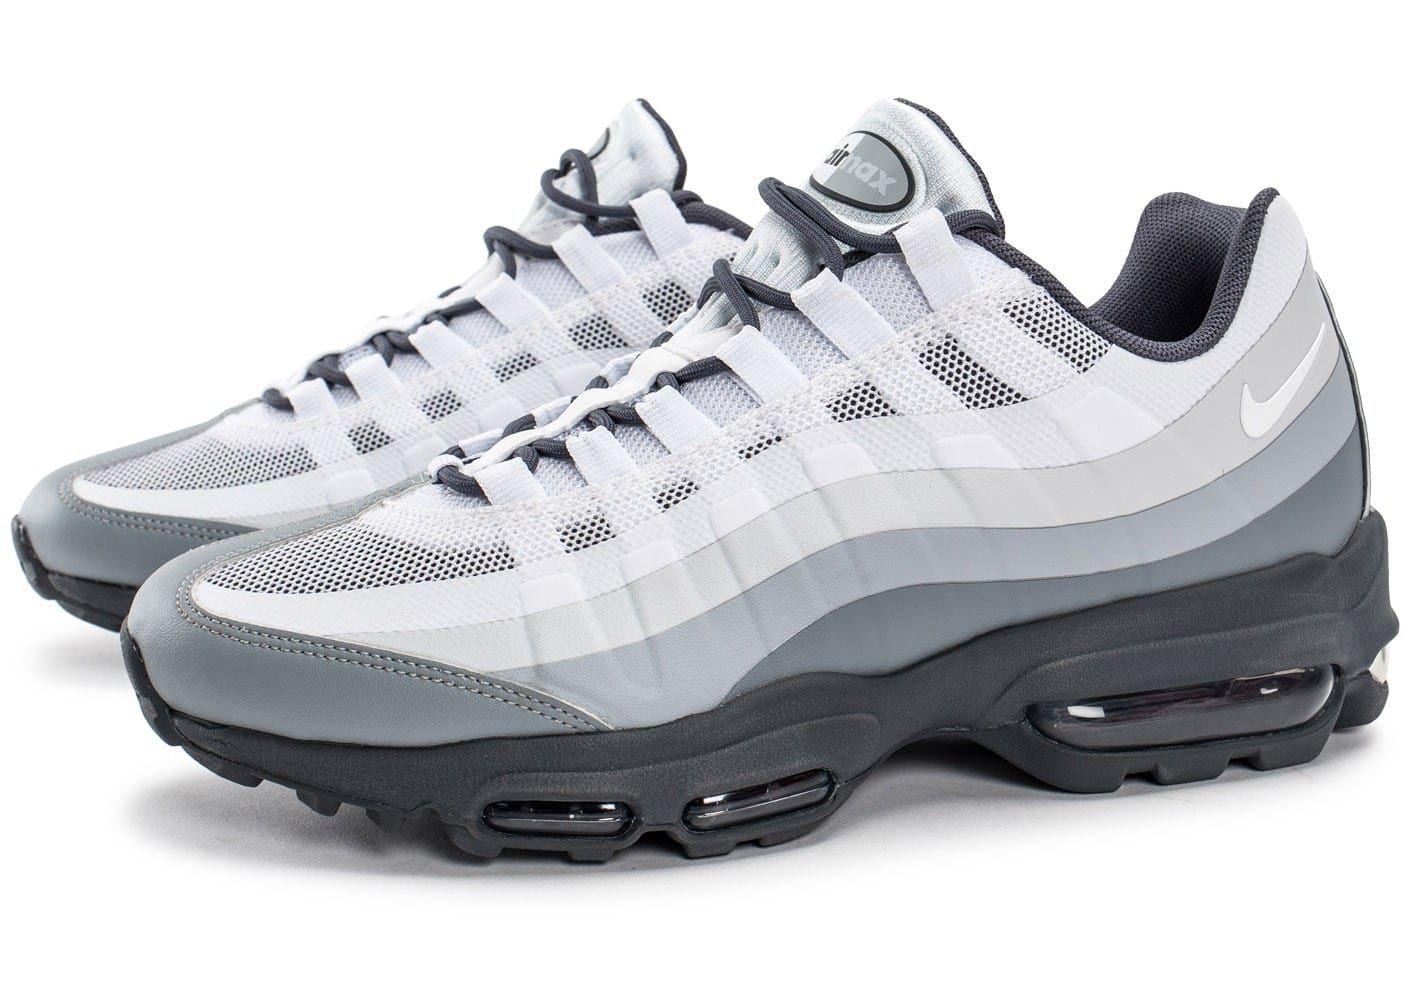 Nike Air Max 95 gris